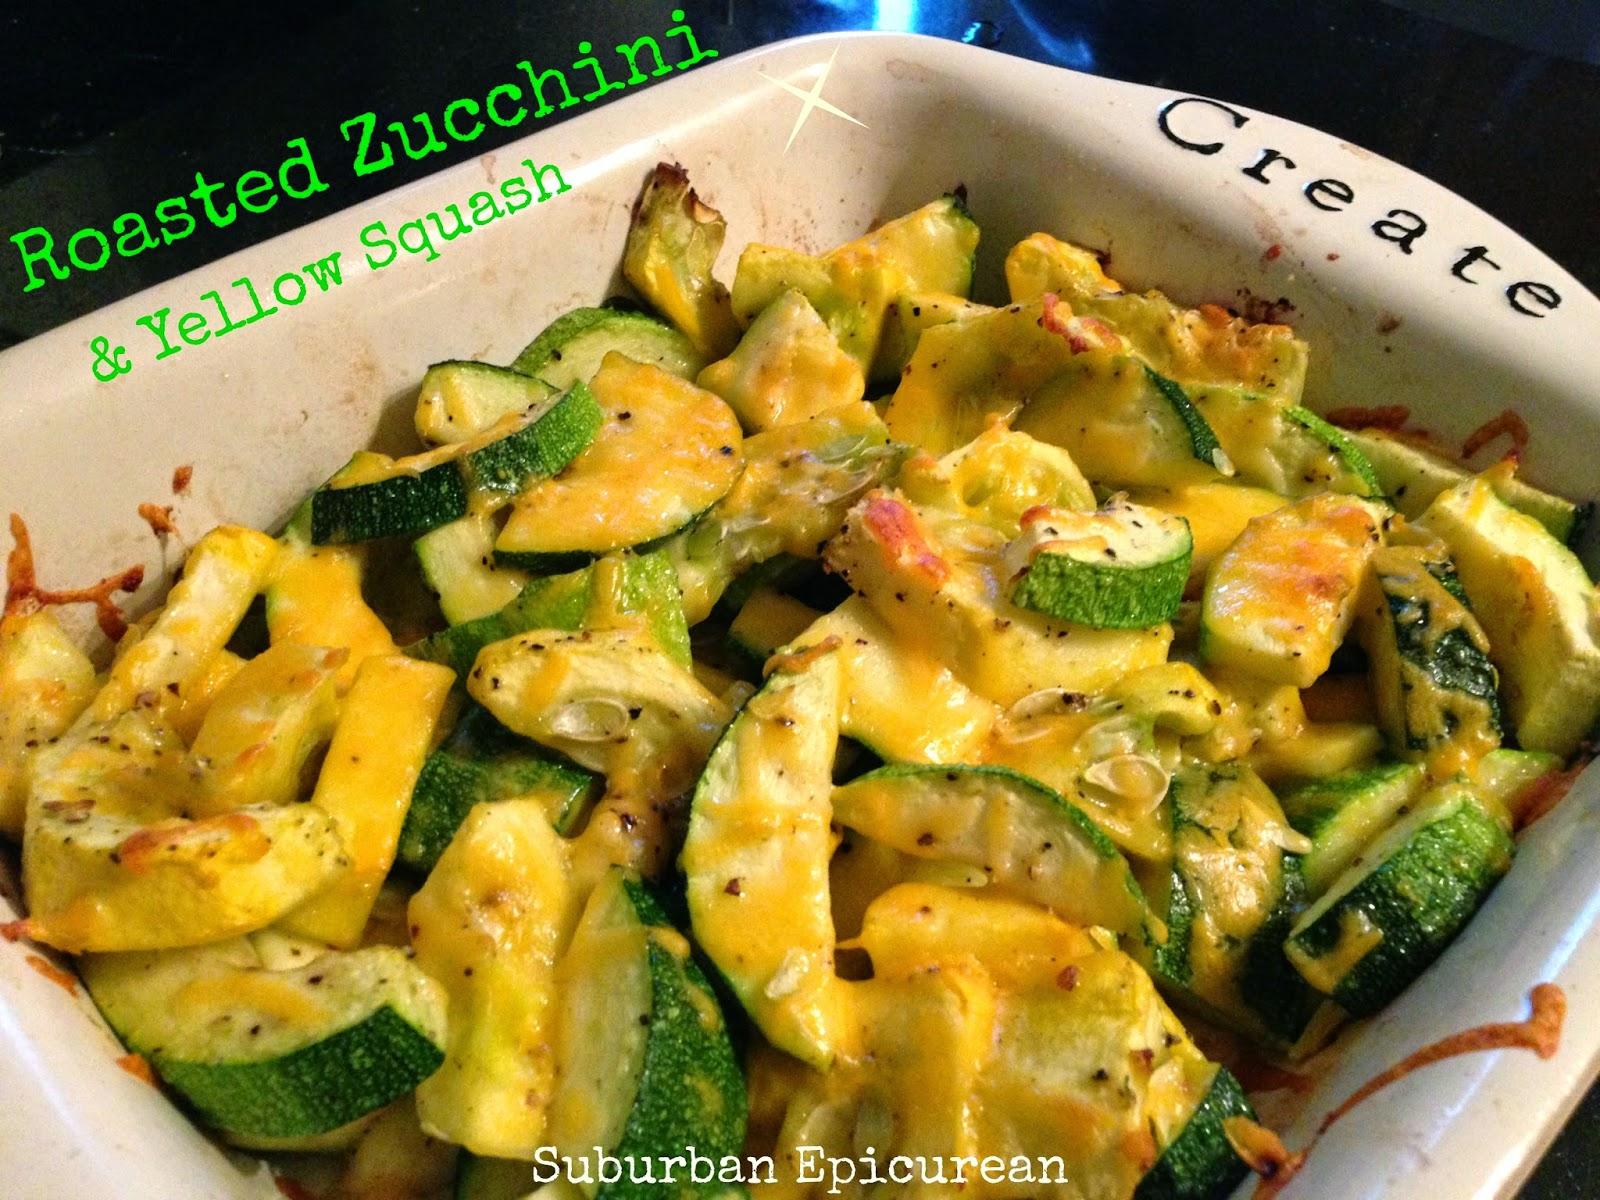 Suburban Epicurean: Roasted Zucchini & Yellow Squash